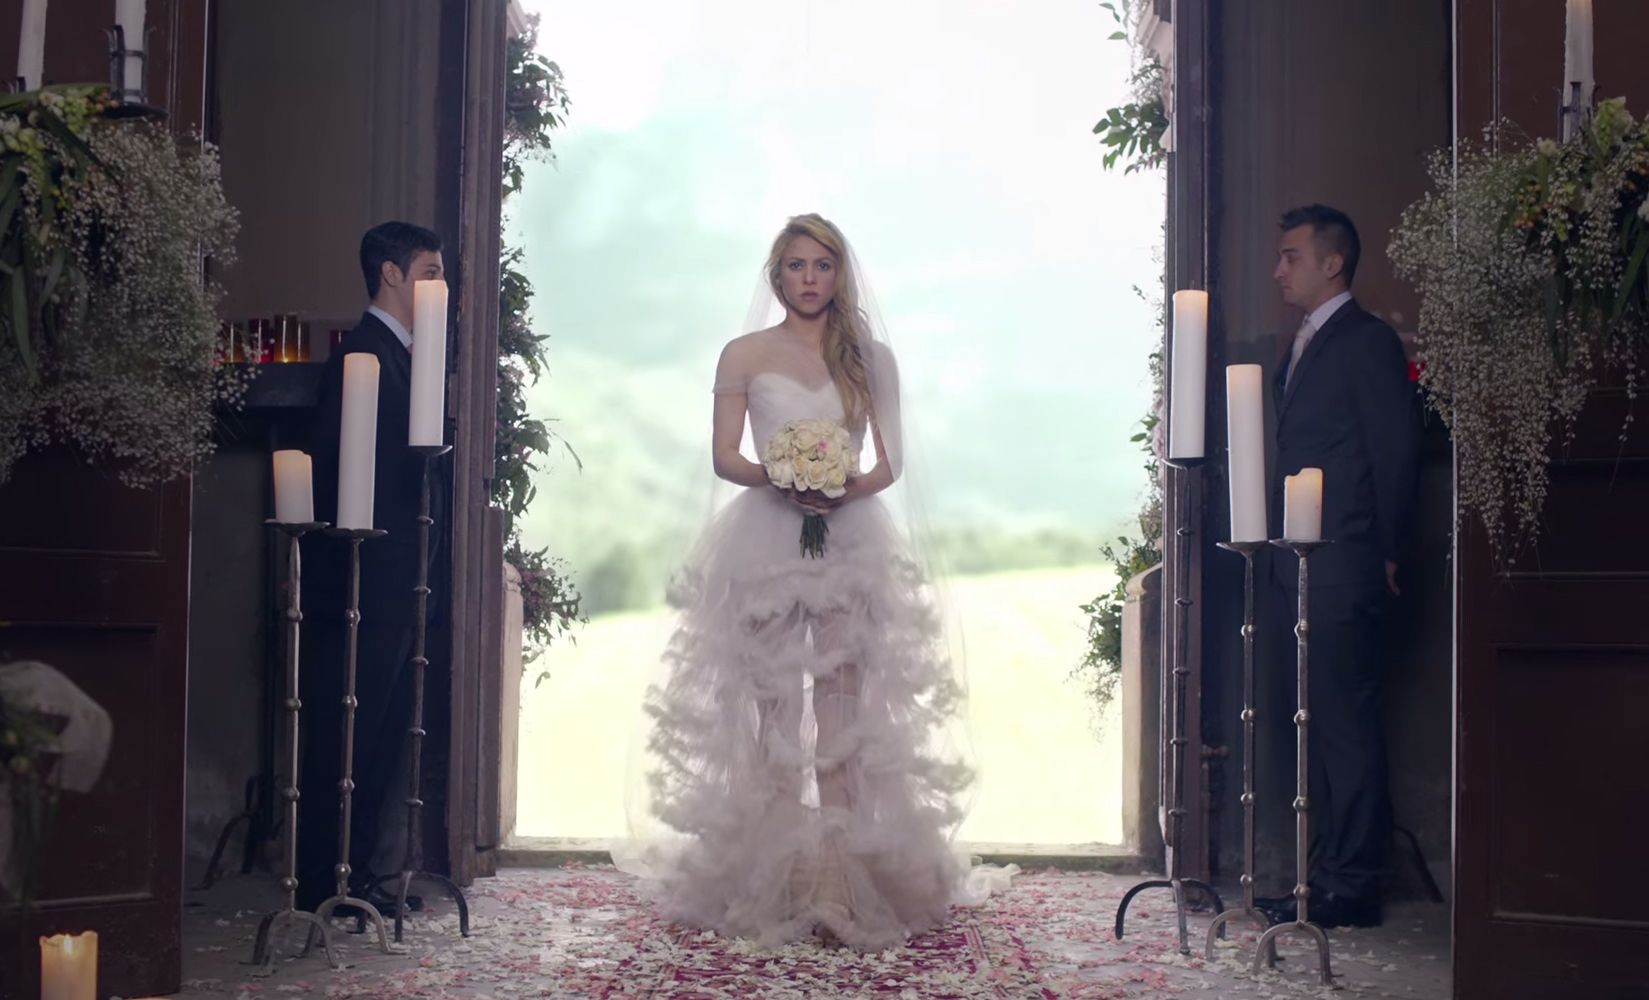 Shakira's Wedding Dress In Empire Video.